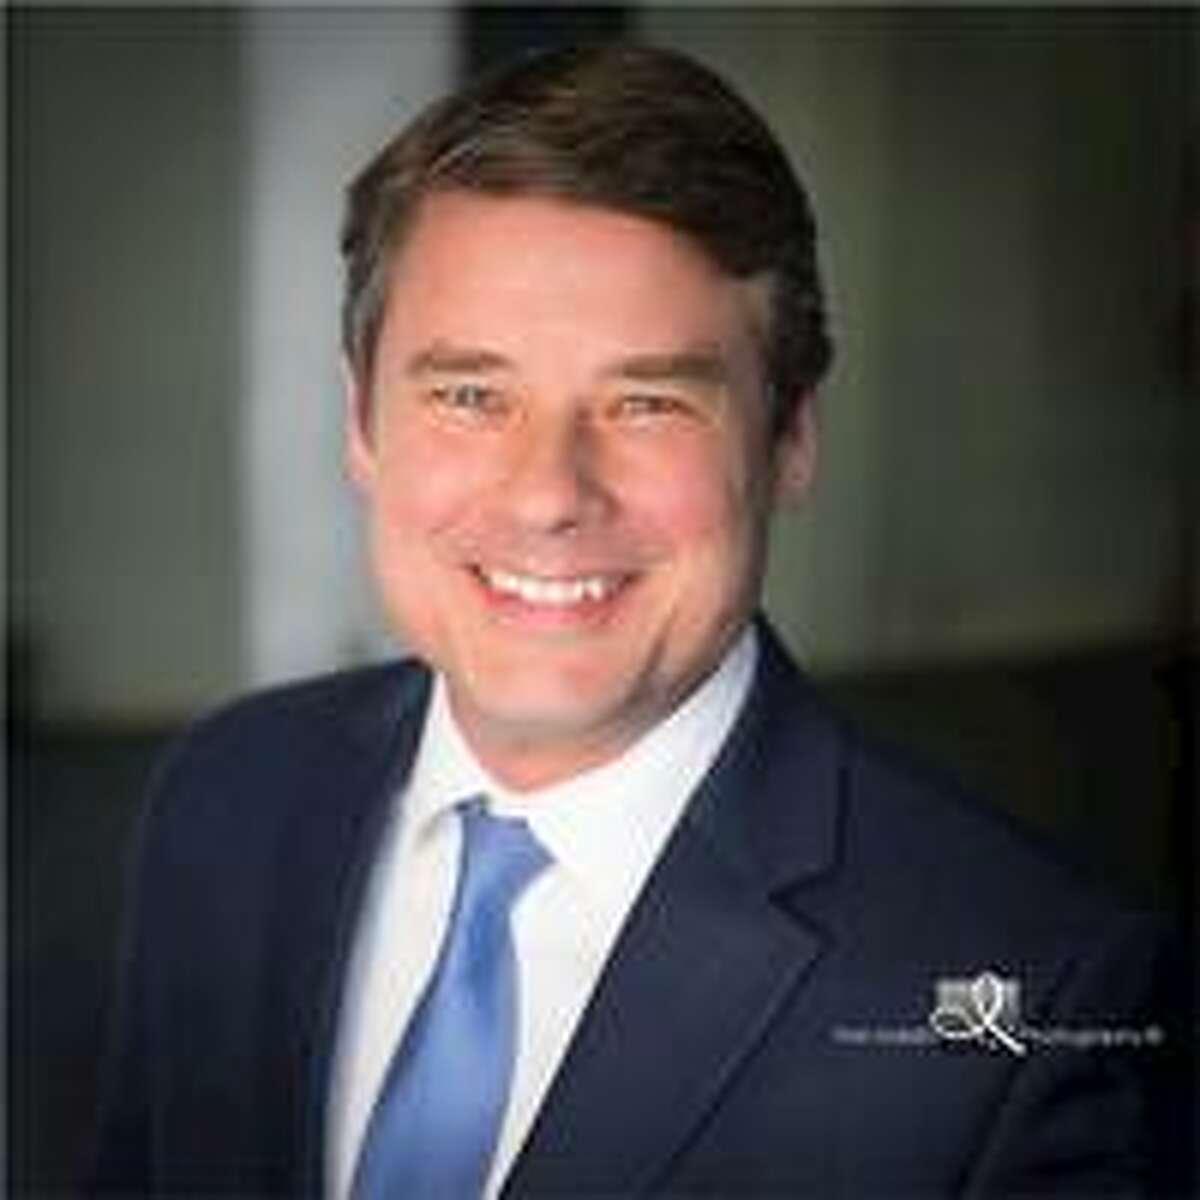 Southbury Economic Development Director Kevin Bielmeier